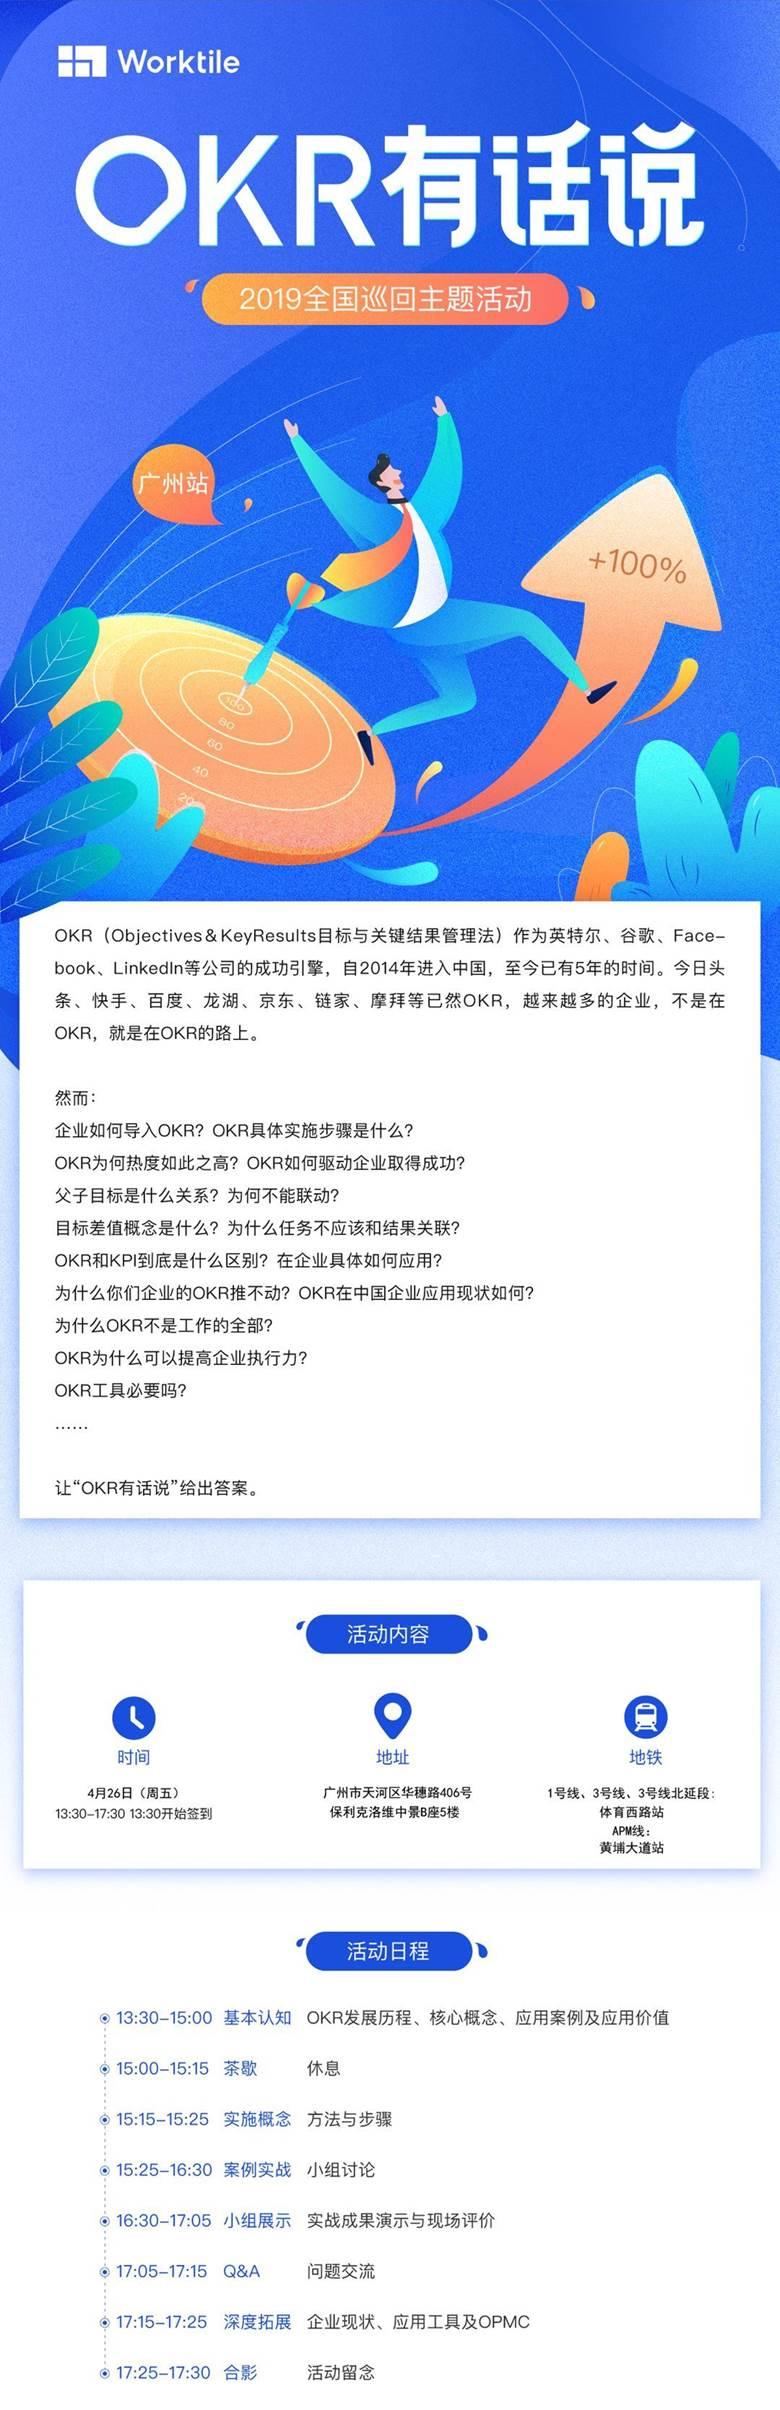 OKR有话说(网页1)广州站.png